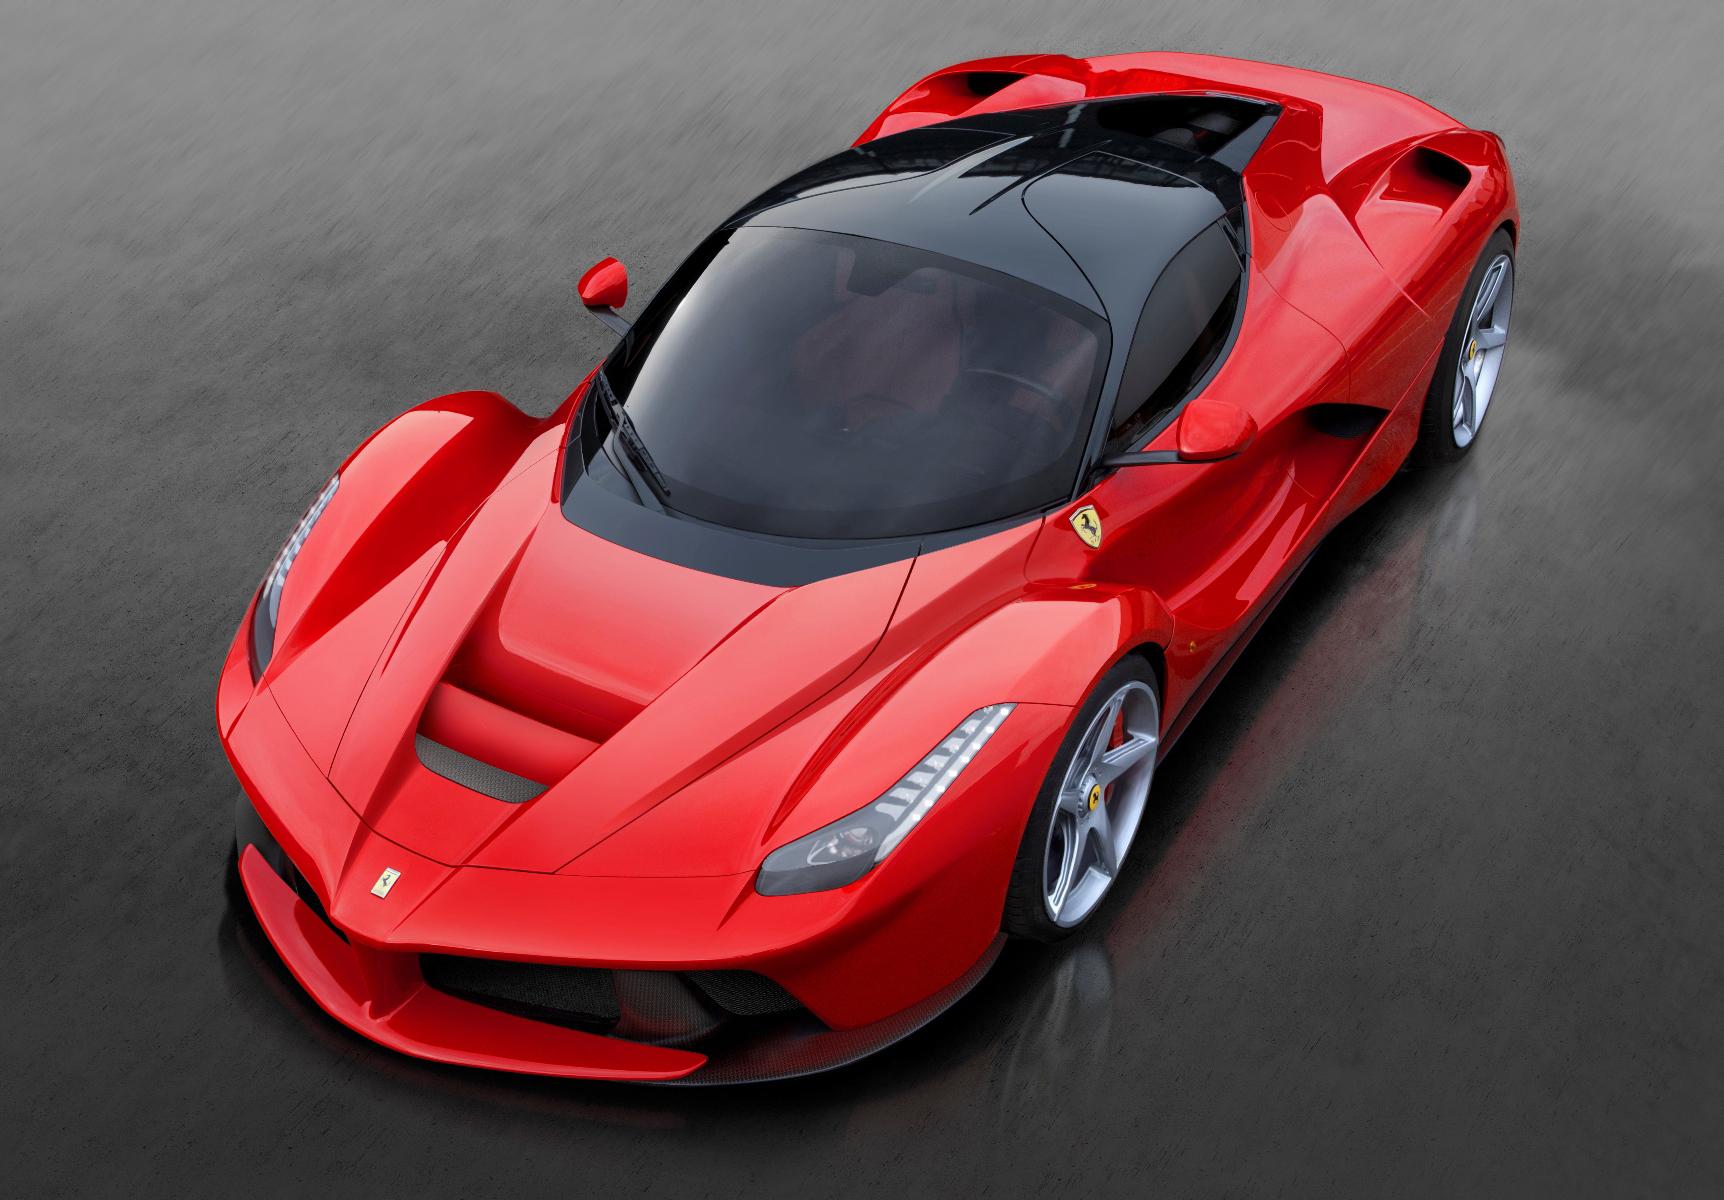 Ferrari_2013_La_Ferrari_LaFerrari_1_499_3